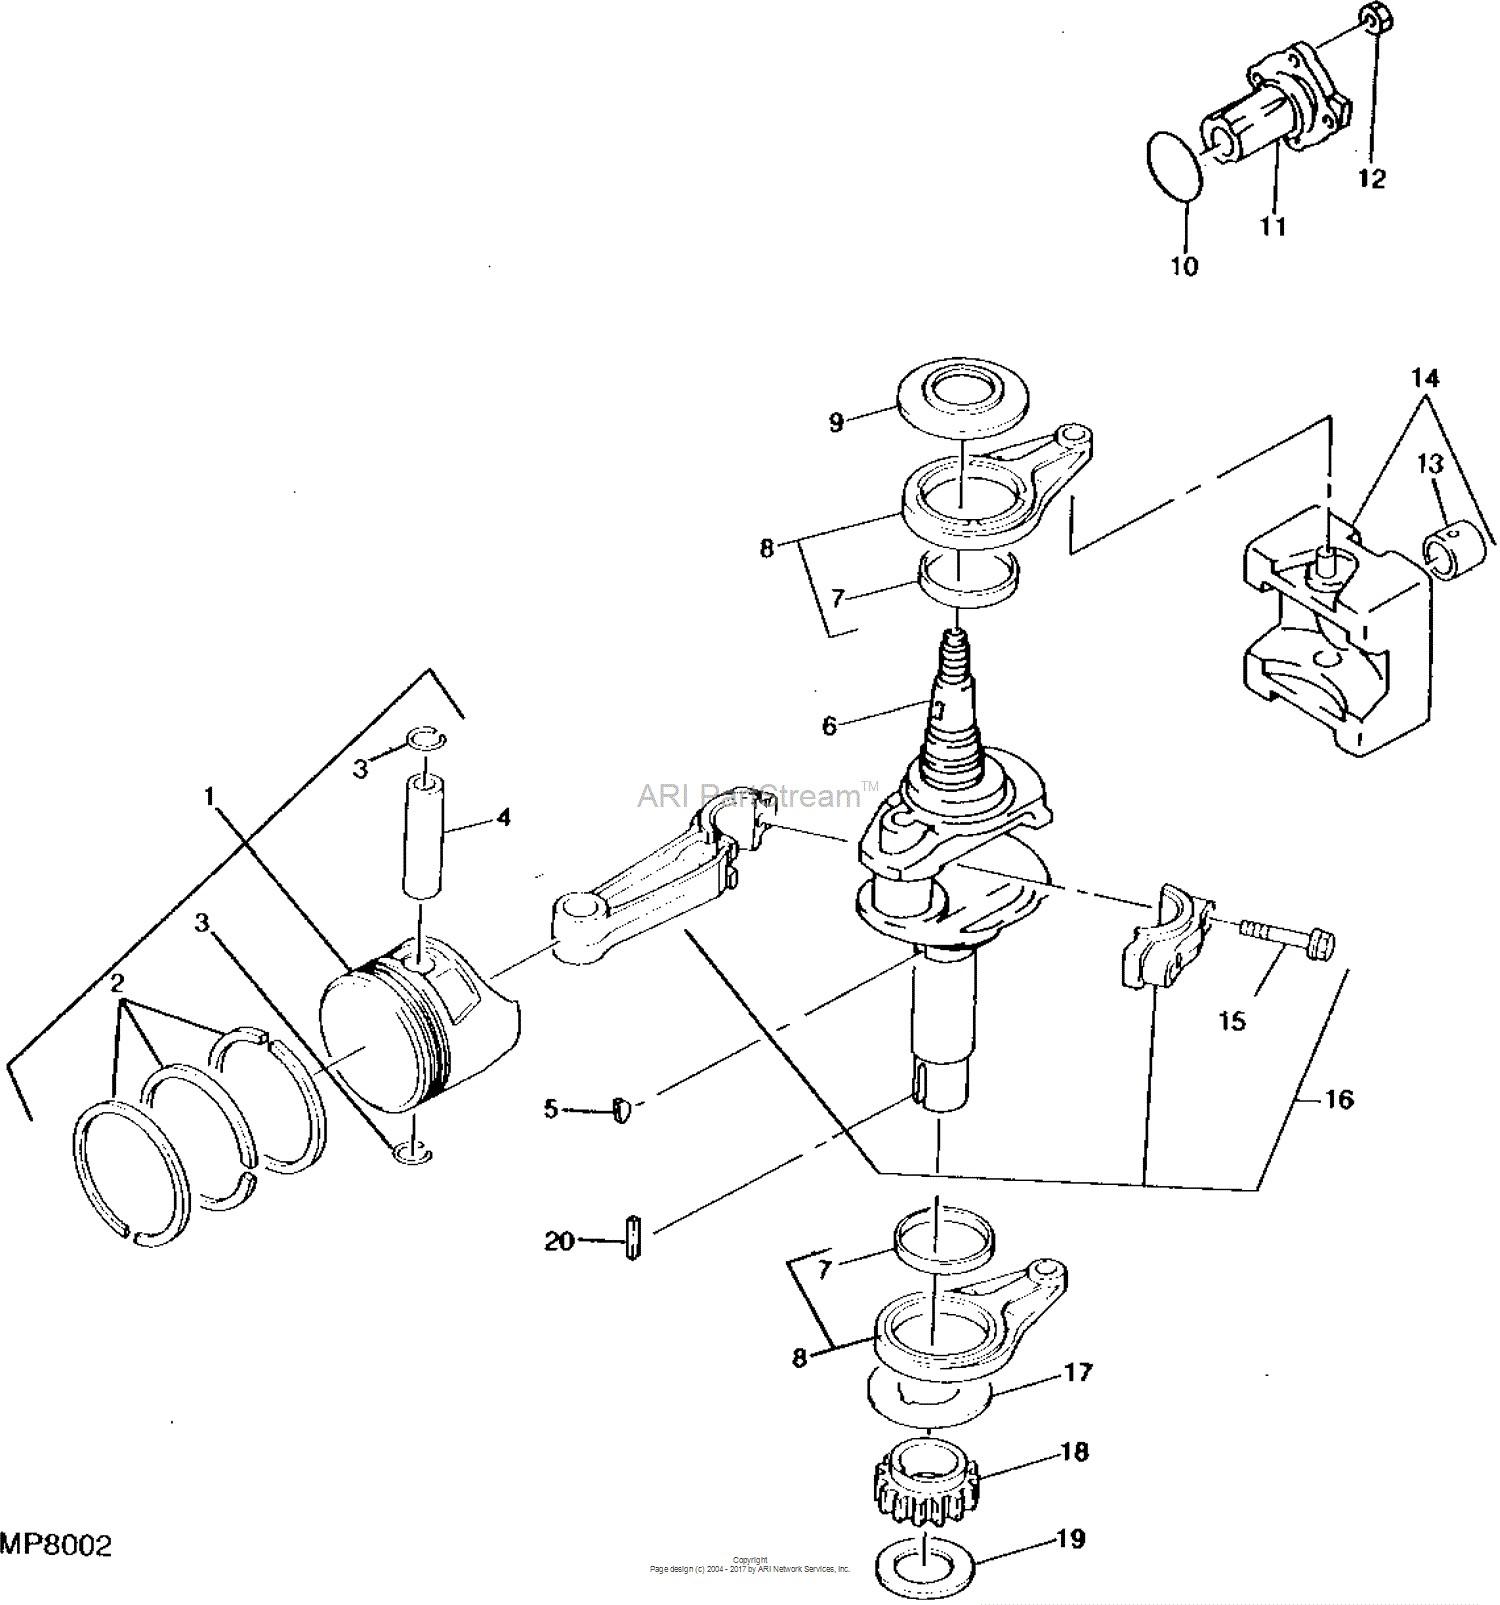 Piston Parts Diagram John Deere Parts Diagrams John Deere F525 Front Mower Shown W Of Piston Parts Diagram